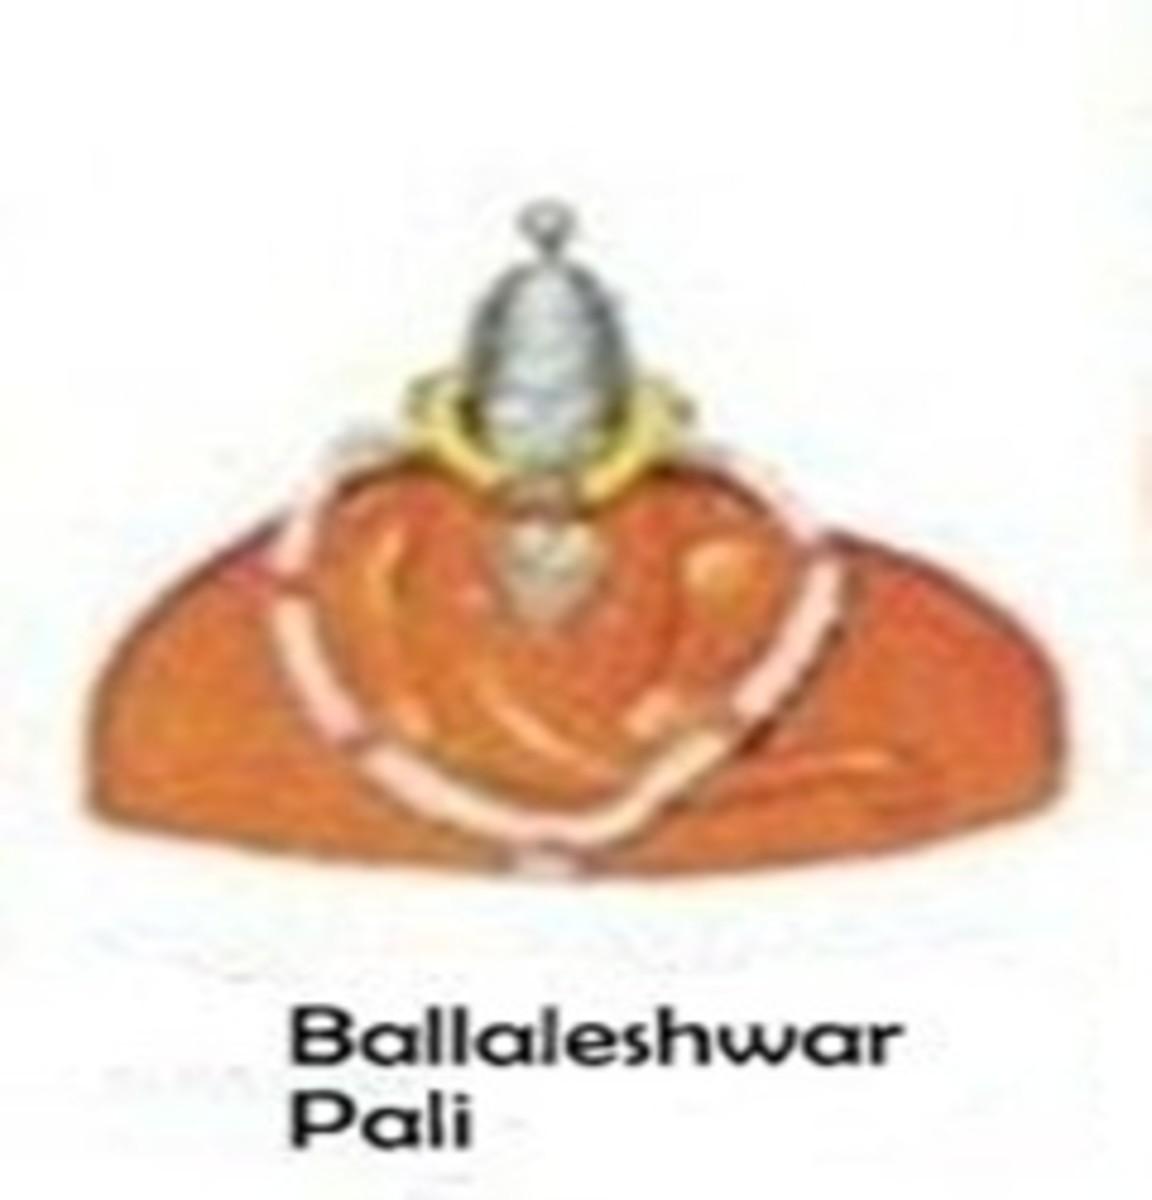 Shri Ballaleshwar Temple, Pali